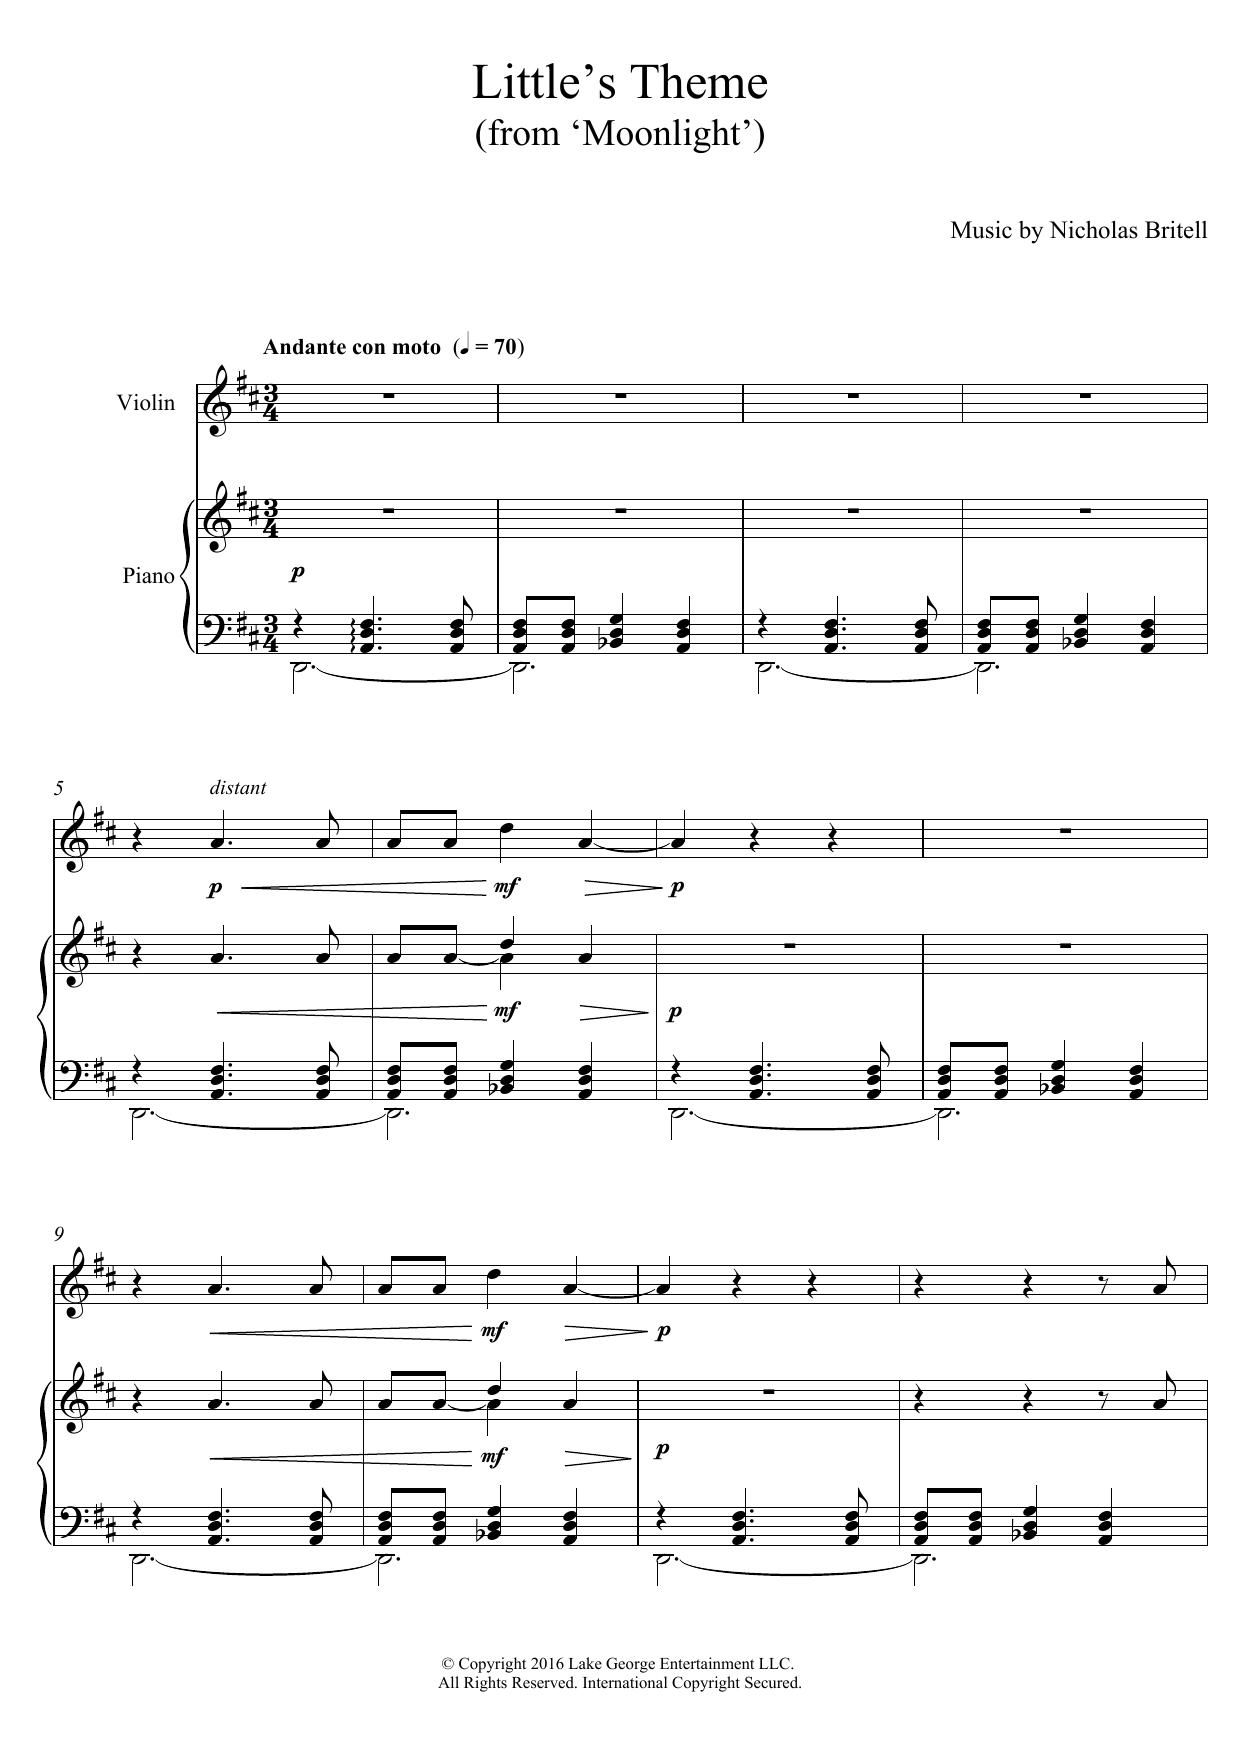 Nicholas Britell: Little's Theme (From Moonlight)